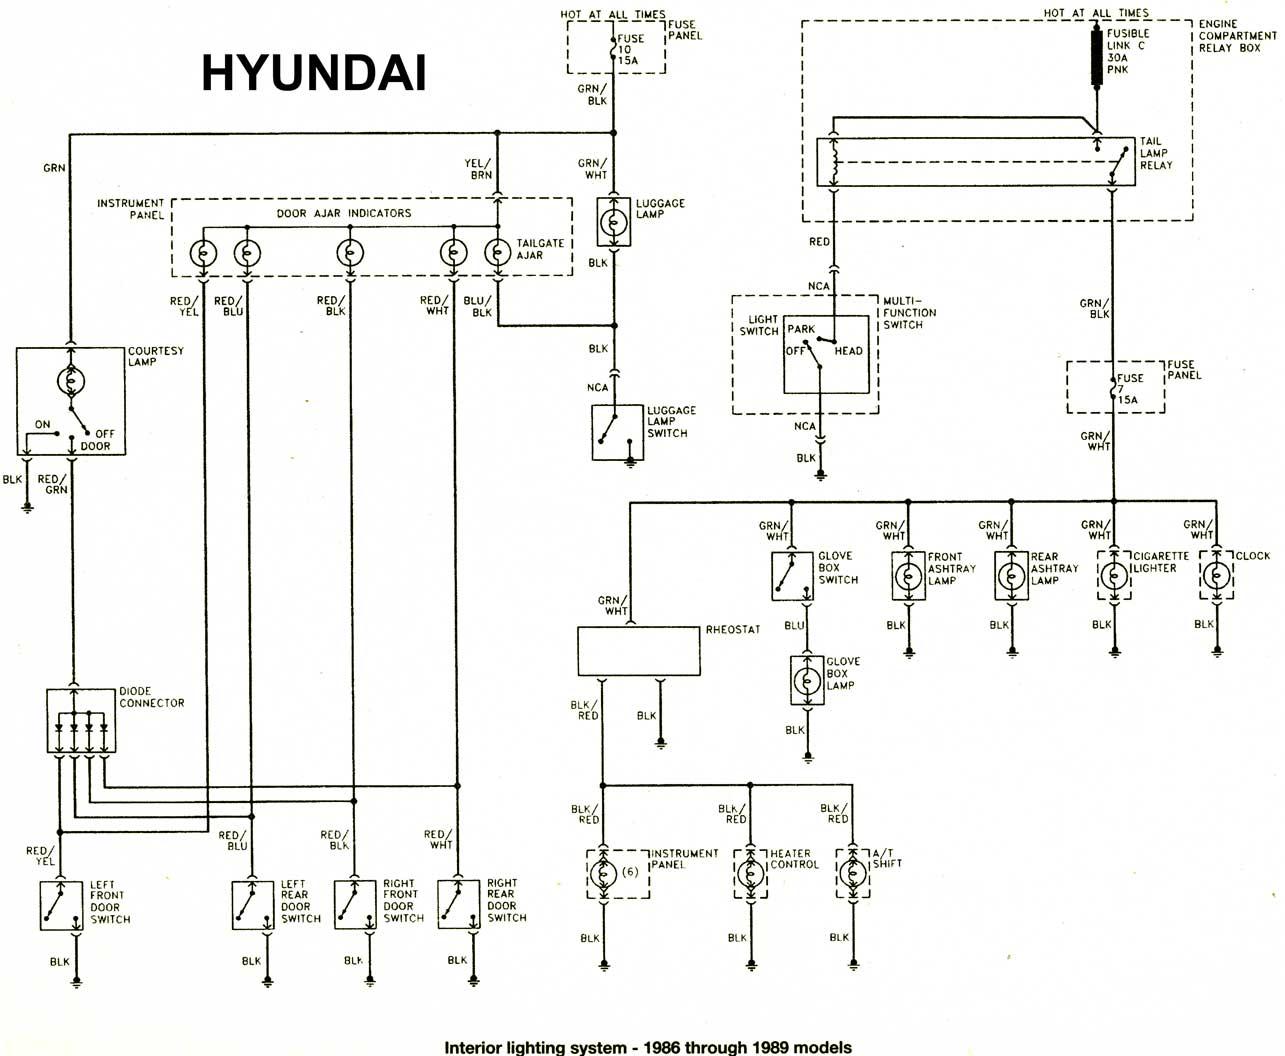 Hyundai Accent 1997 Wiring Diagram Schematics Diagrams 2007 Stereo 1986 97 Diagramas Esquemas Ubicacion De Radio 2009